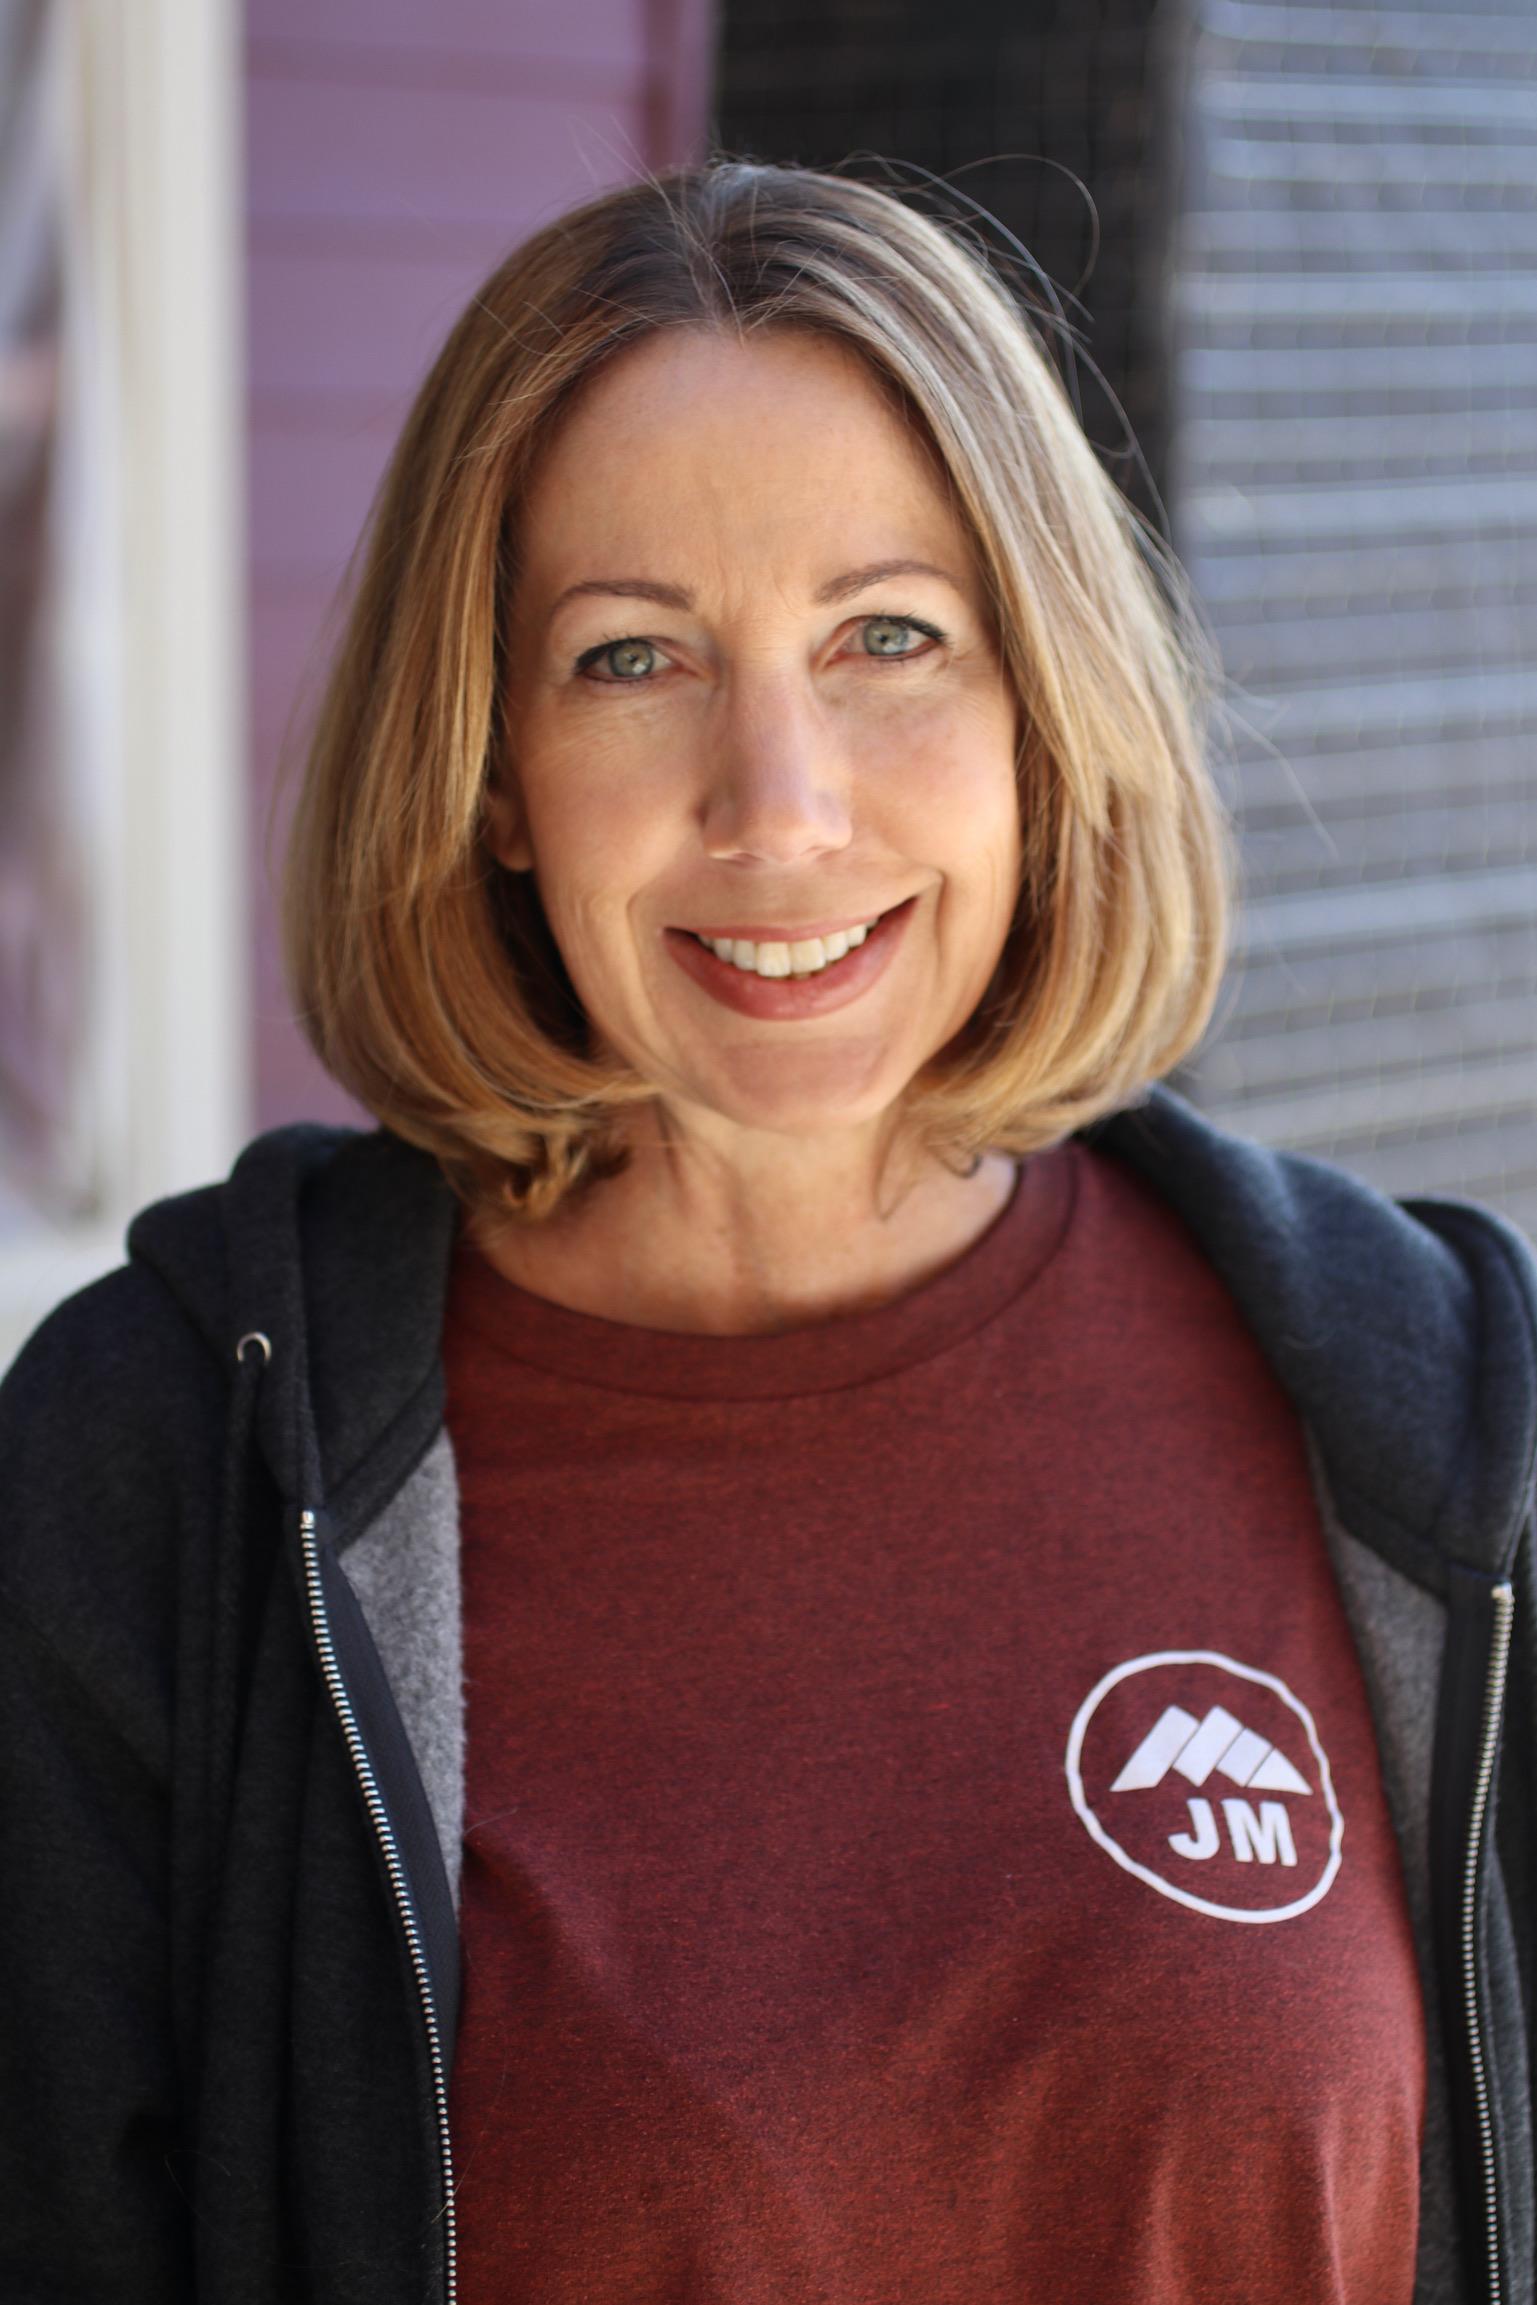 Laurel Marshall